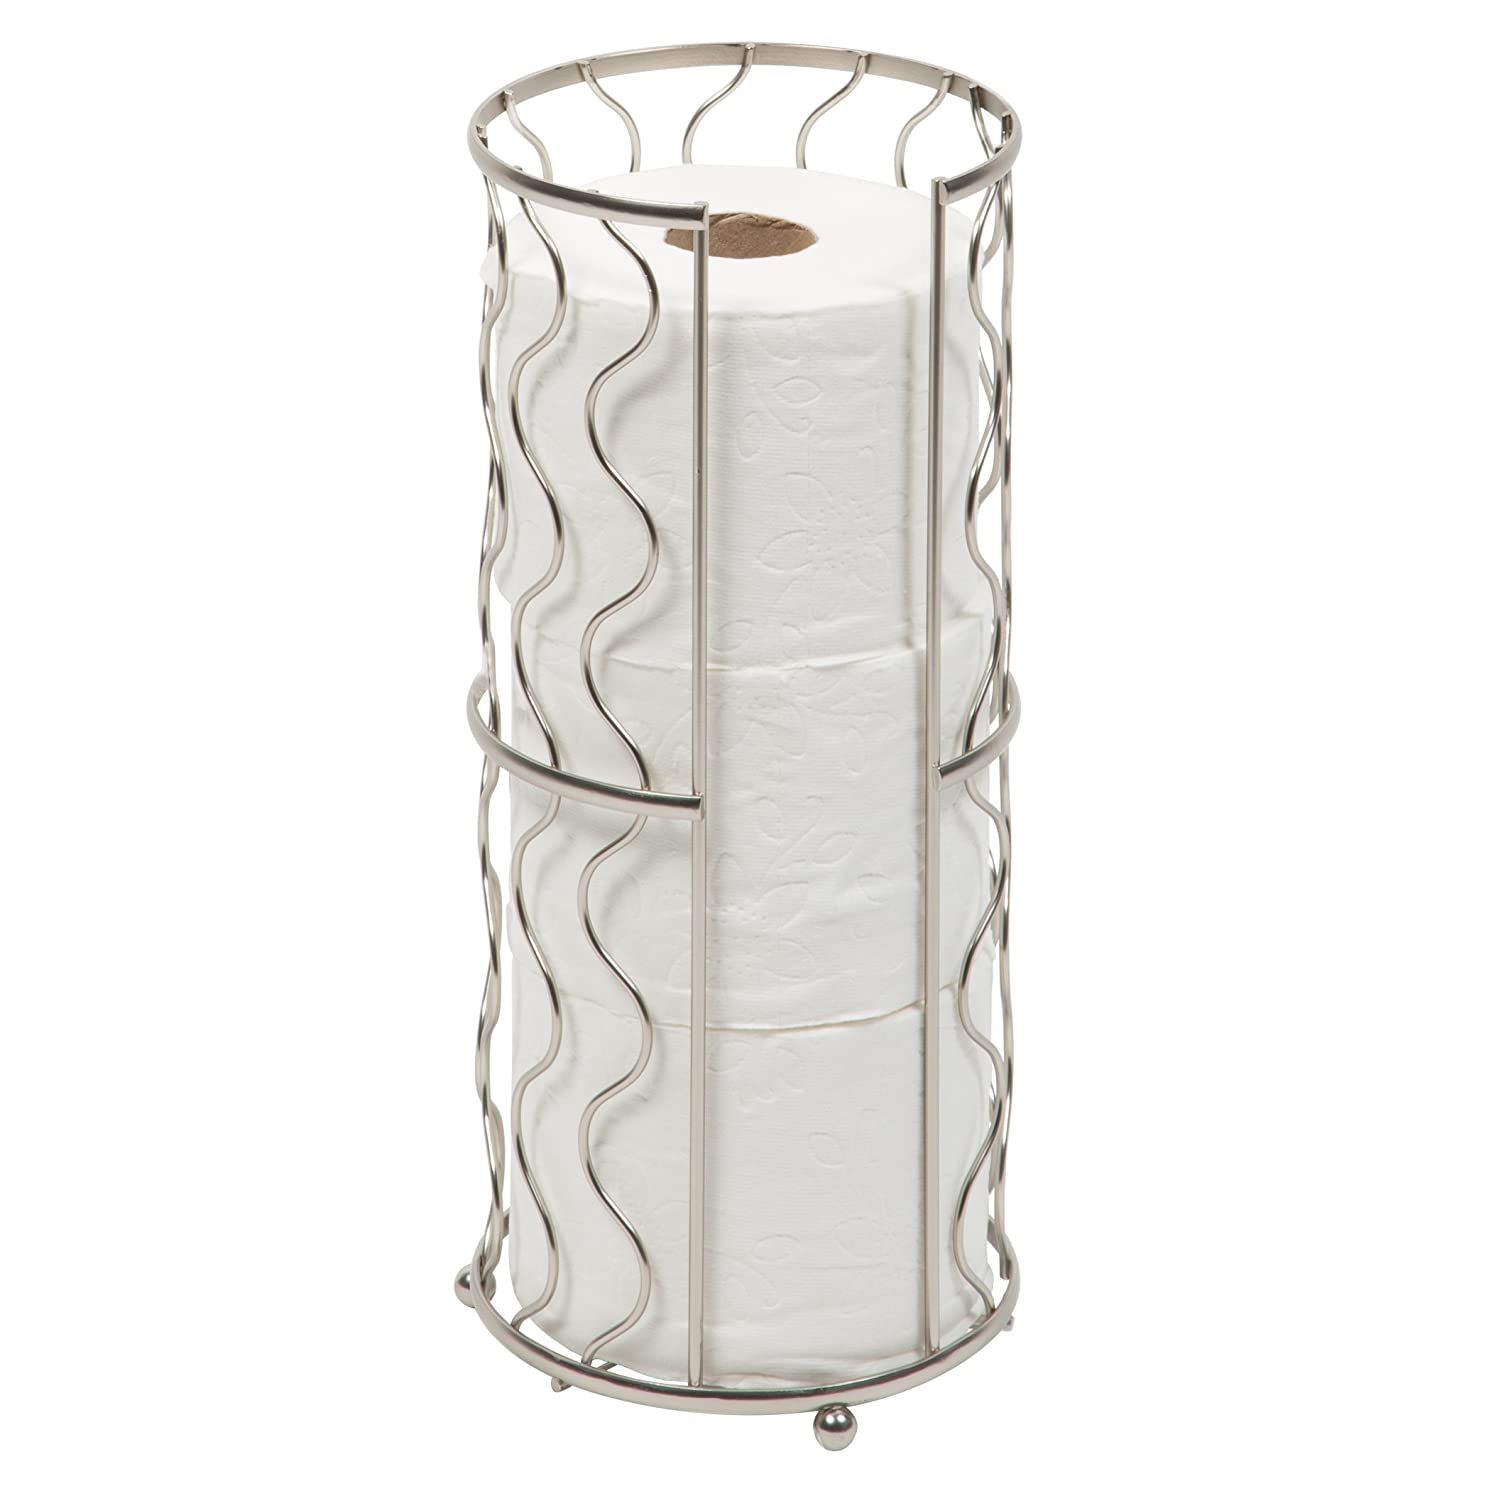 Richards Homewares Toilet Paper Storage Reserve - Free Standing - Modern Bathroom Space Saver - Holds 3 Standard Rolls – Satin Nickel